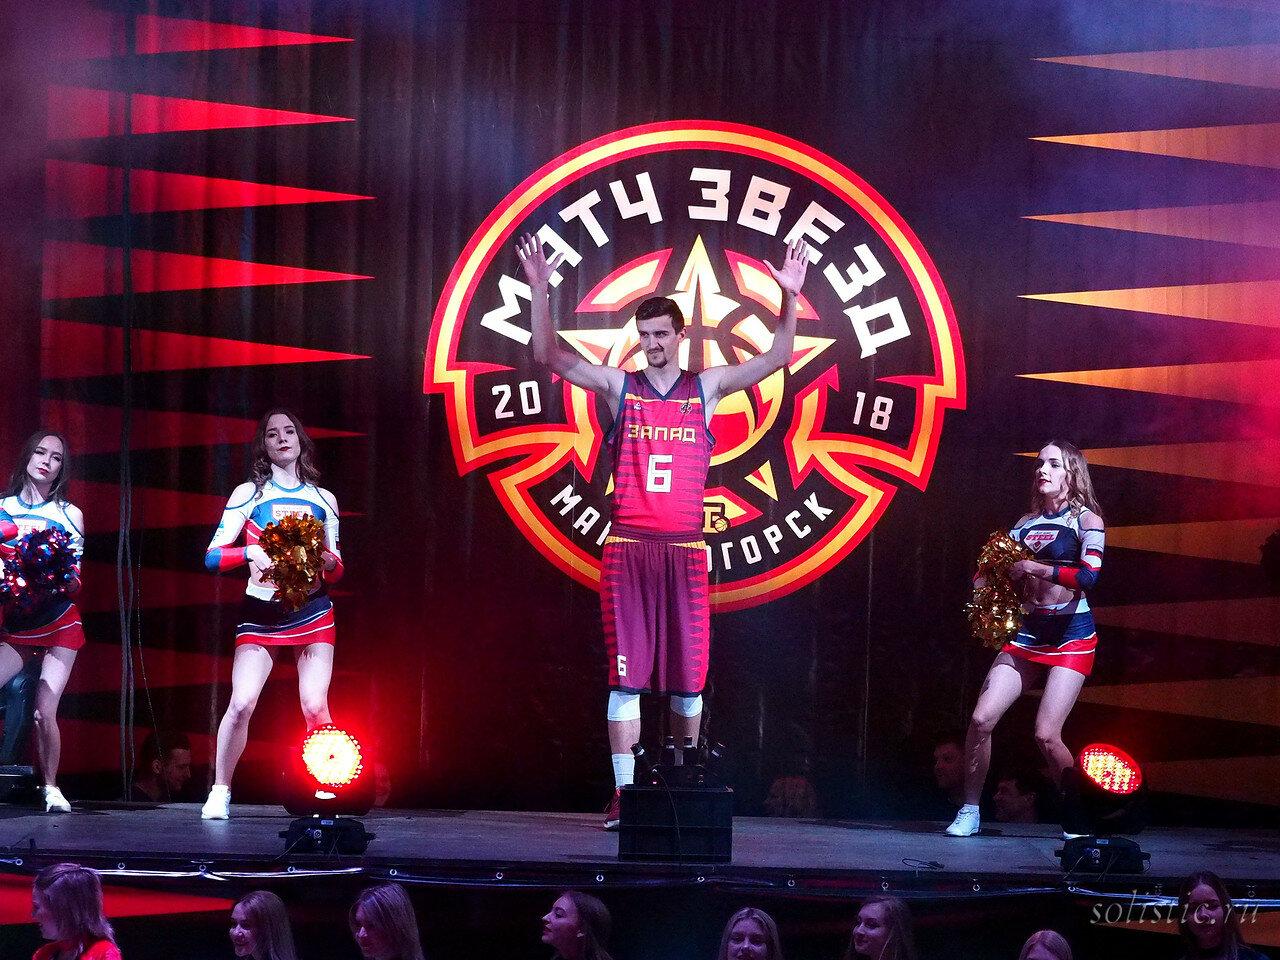 18 Матч звезд АСБ 2018 (ассоциации студенческого баскетбола)